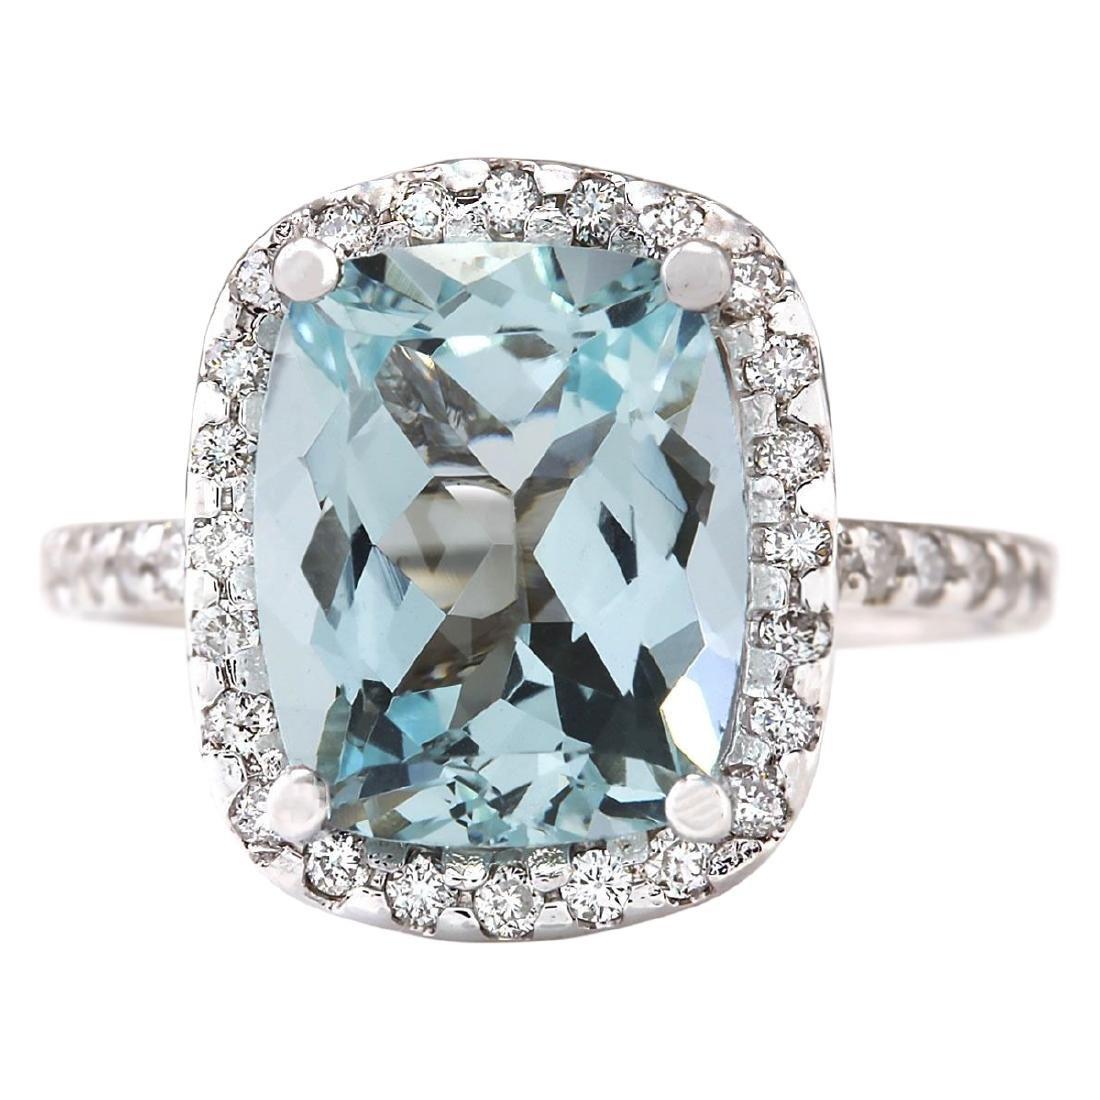 4.30 CTW Natural Aquamarine And Diamond Ring In 18K